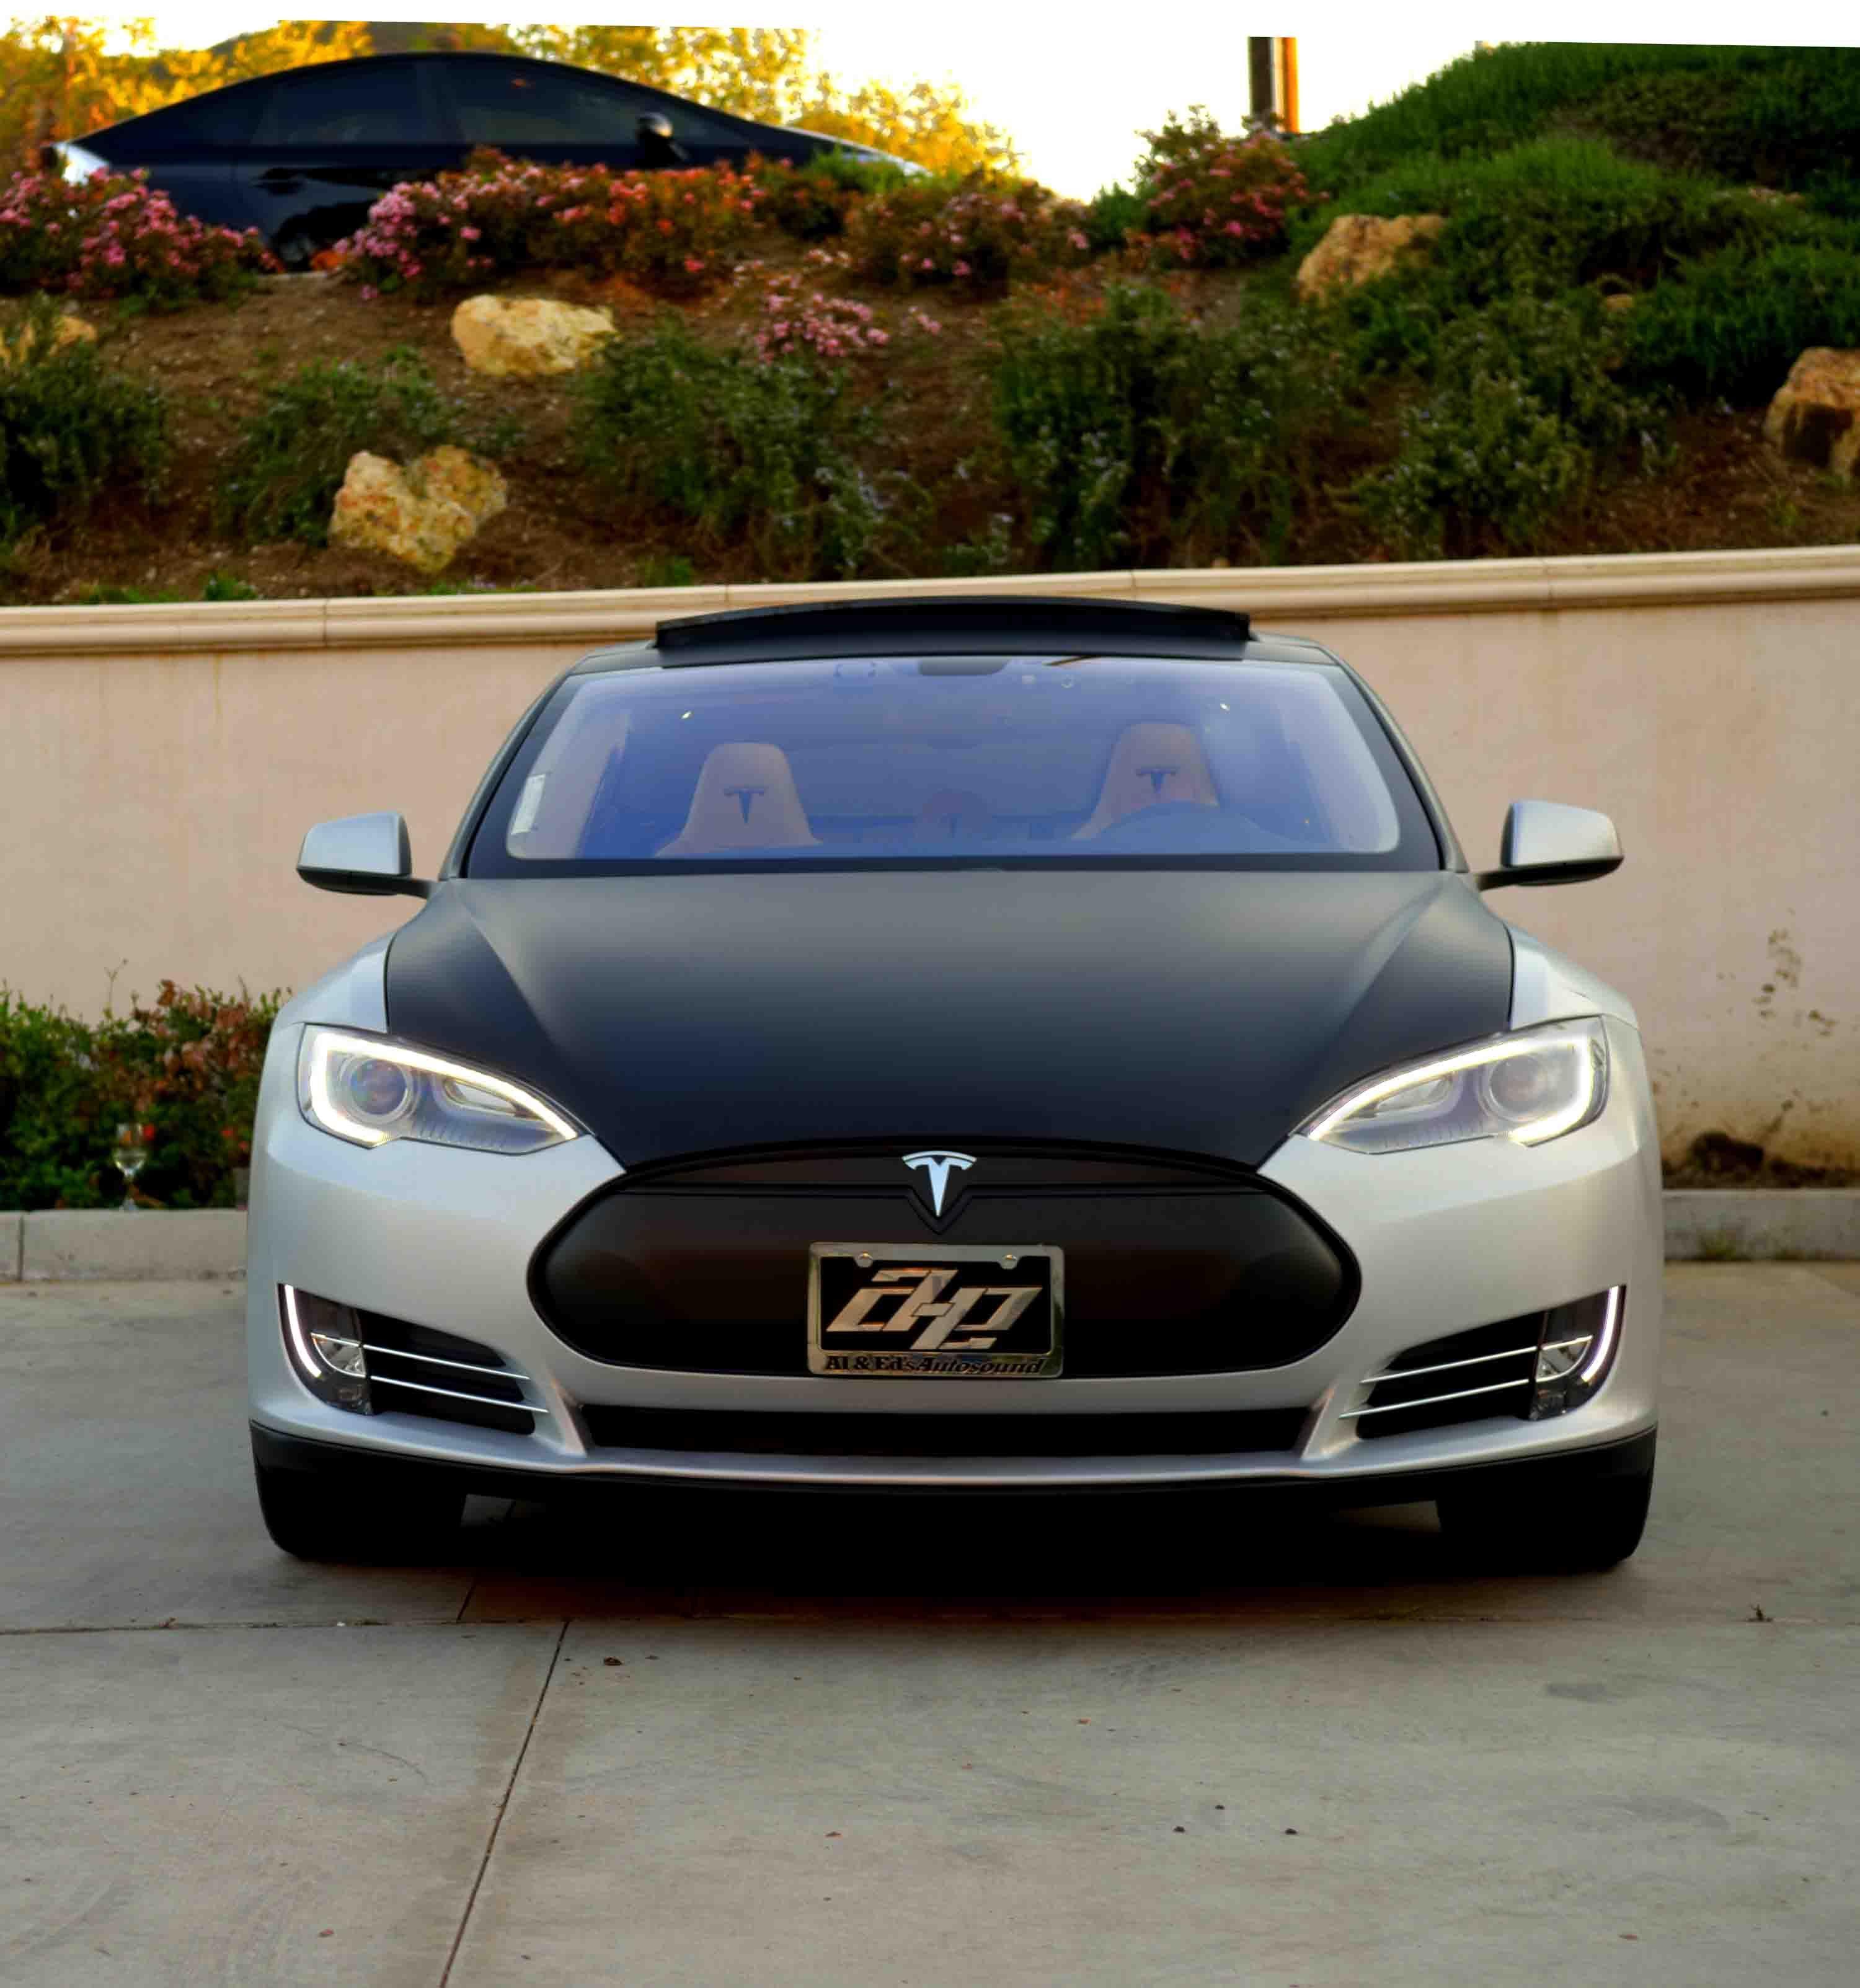 Discover Ideas About Tesla Roadster Pinterestcom: Two Tone Wrapped Tesla Model S - Google Search